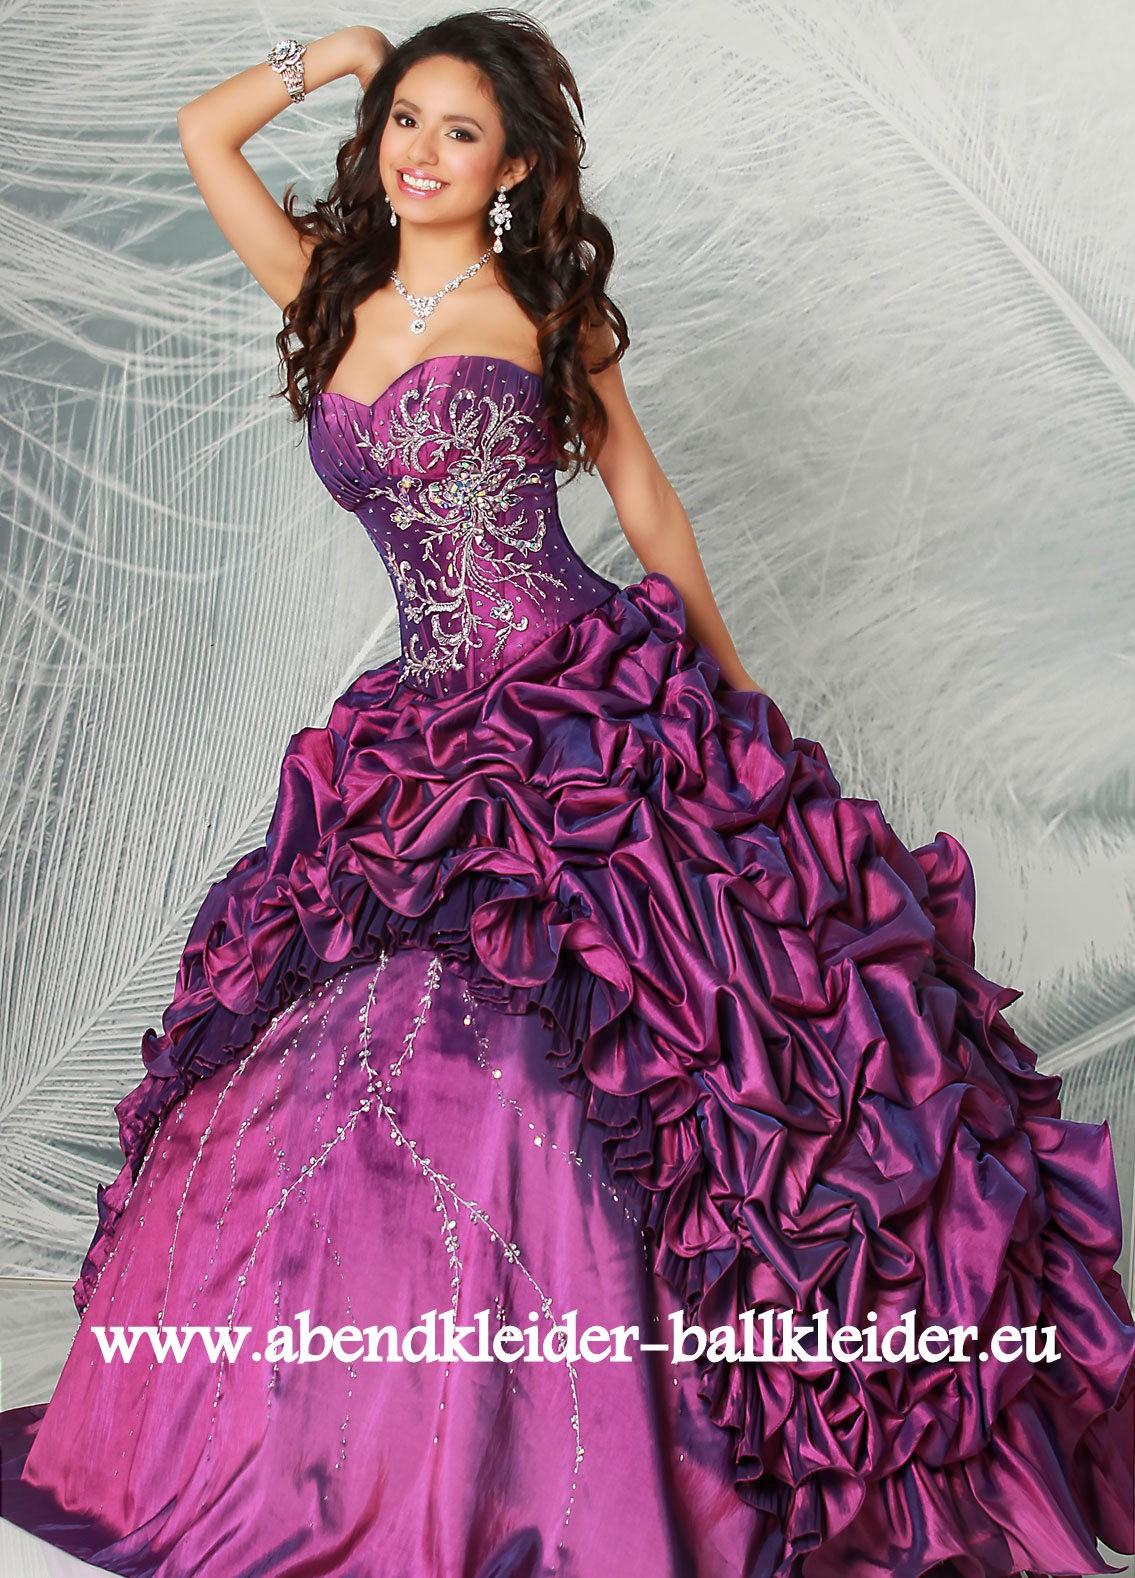 Abend Elegant Lila Abend Kleider VertriebFormal Kreativ Lila Abend Kleider Boutique